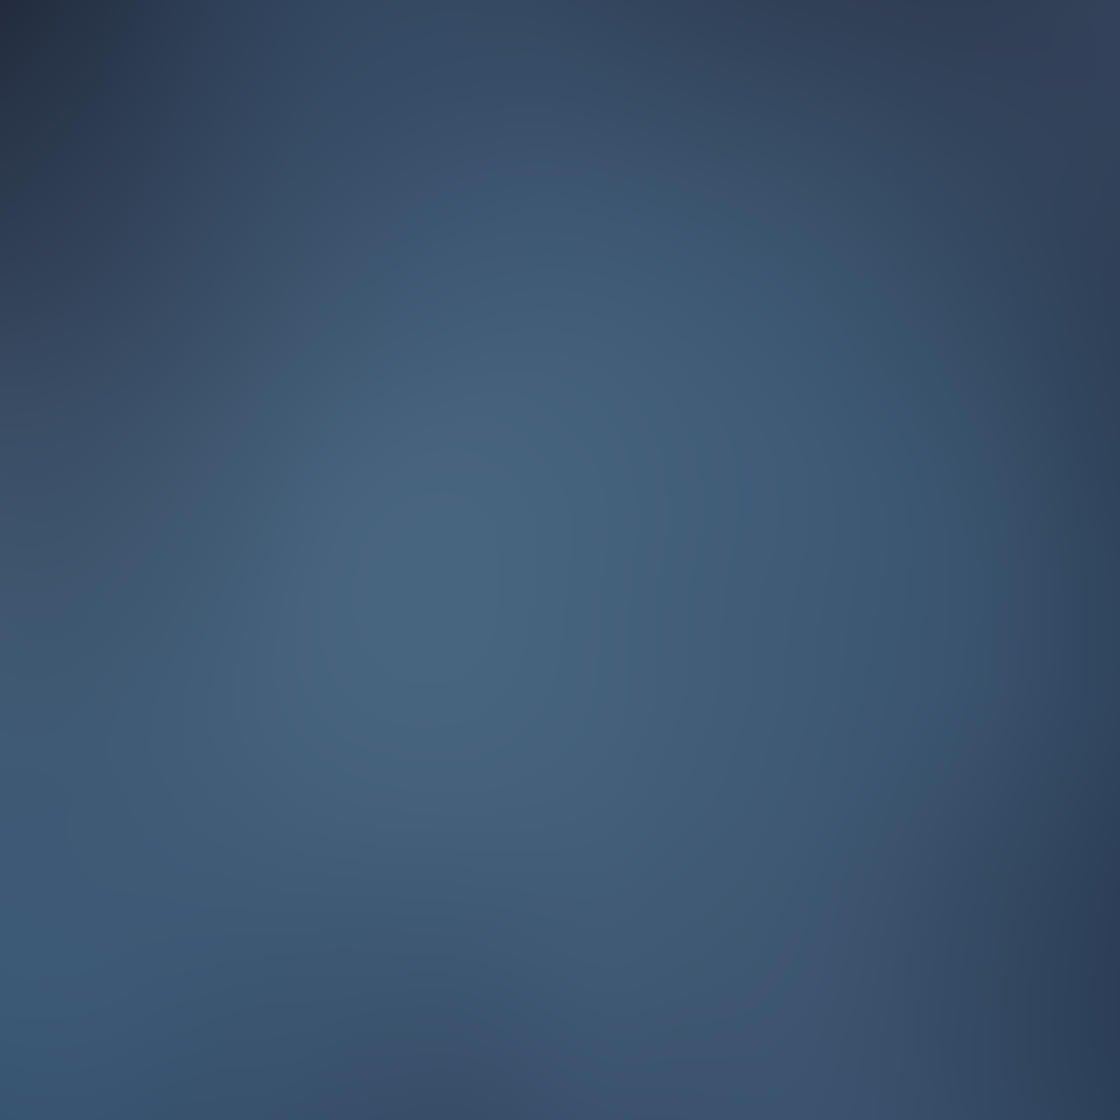 iPhone Photos Blue Color 10